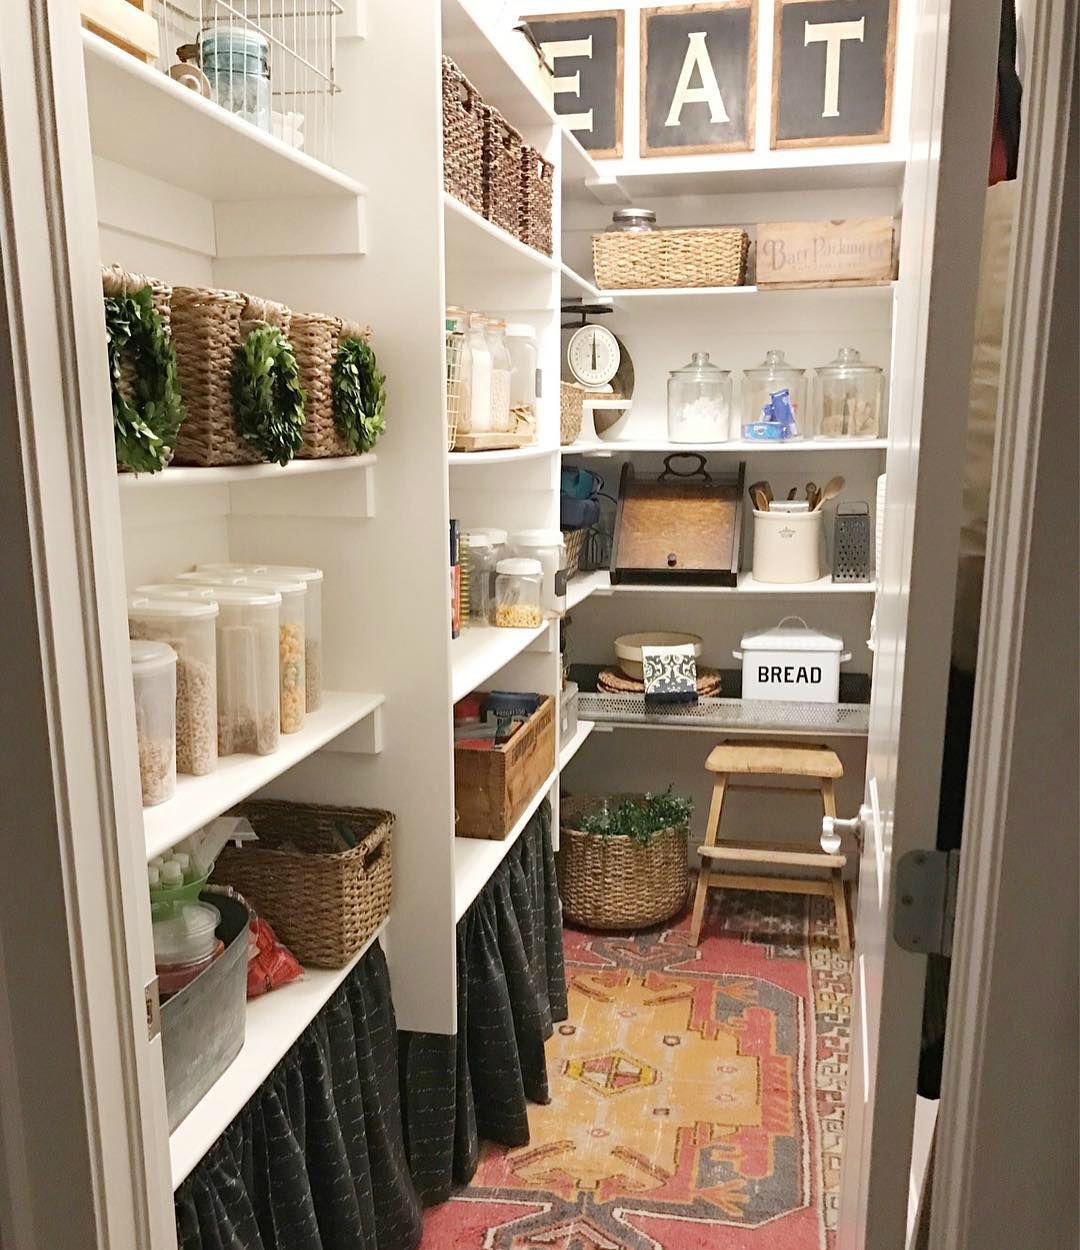 Кладовая на кухне фото